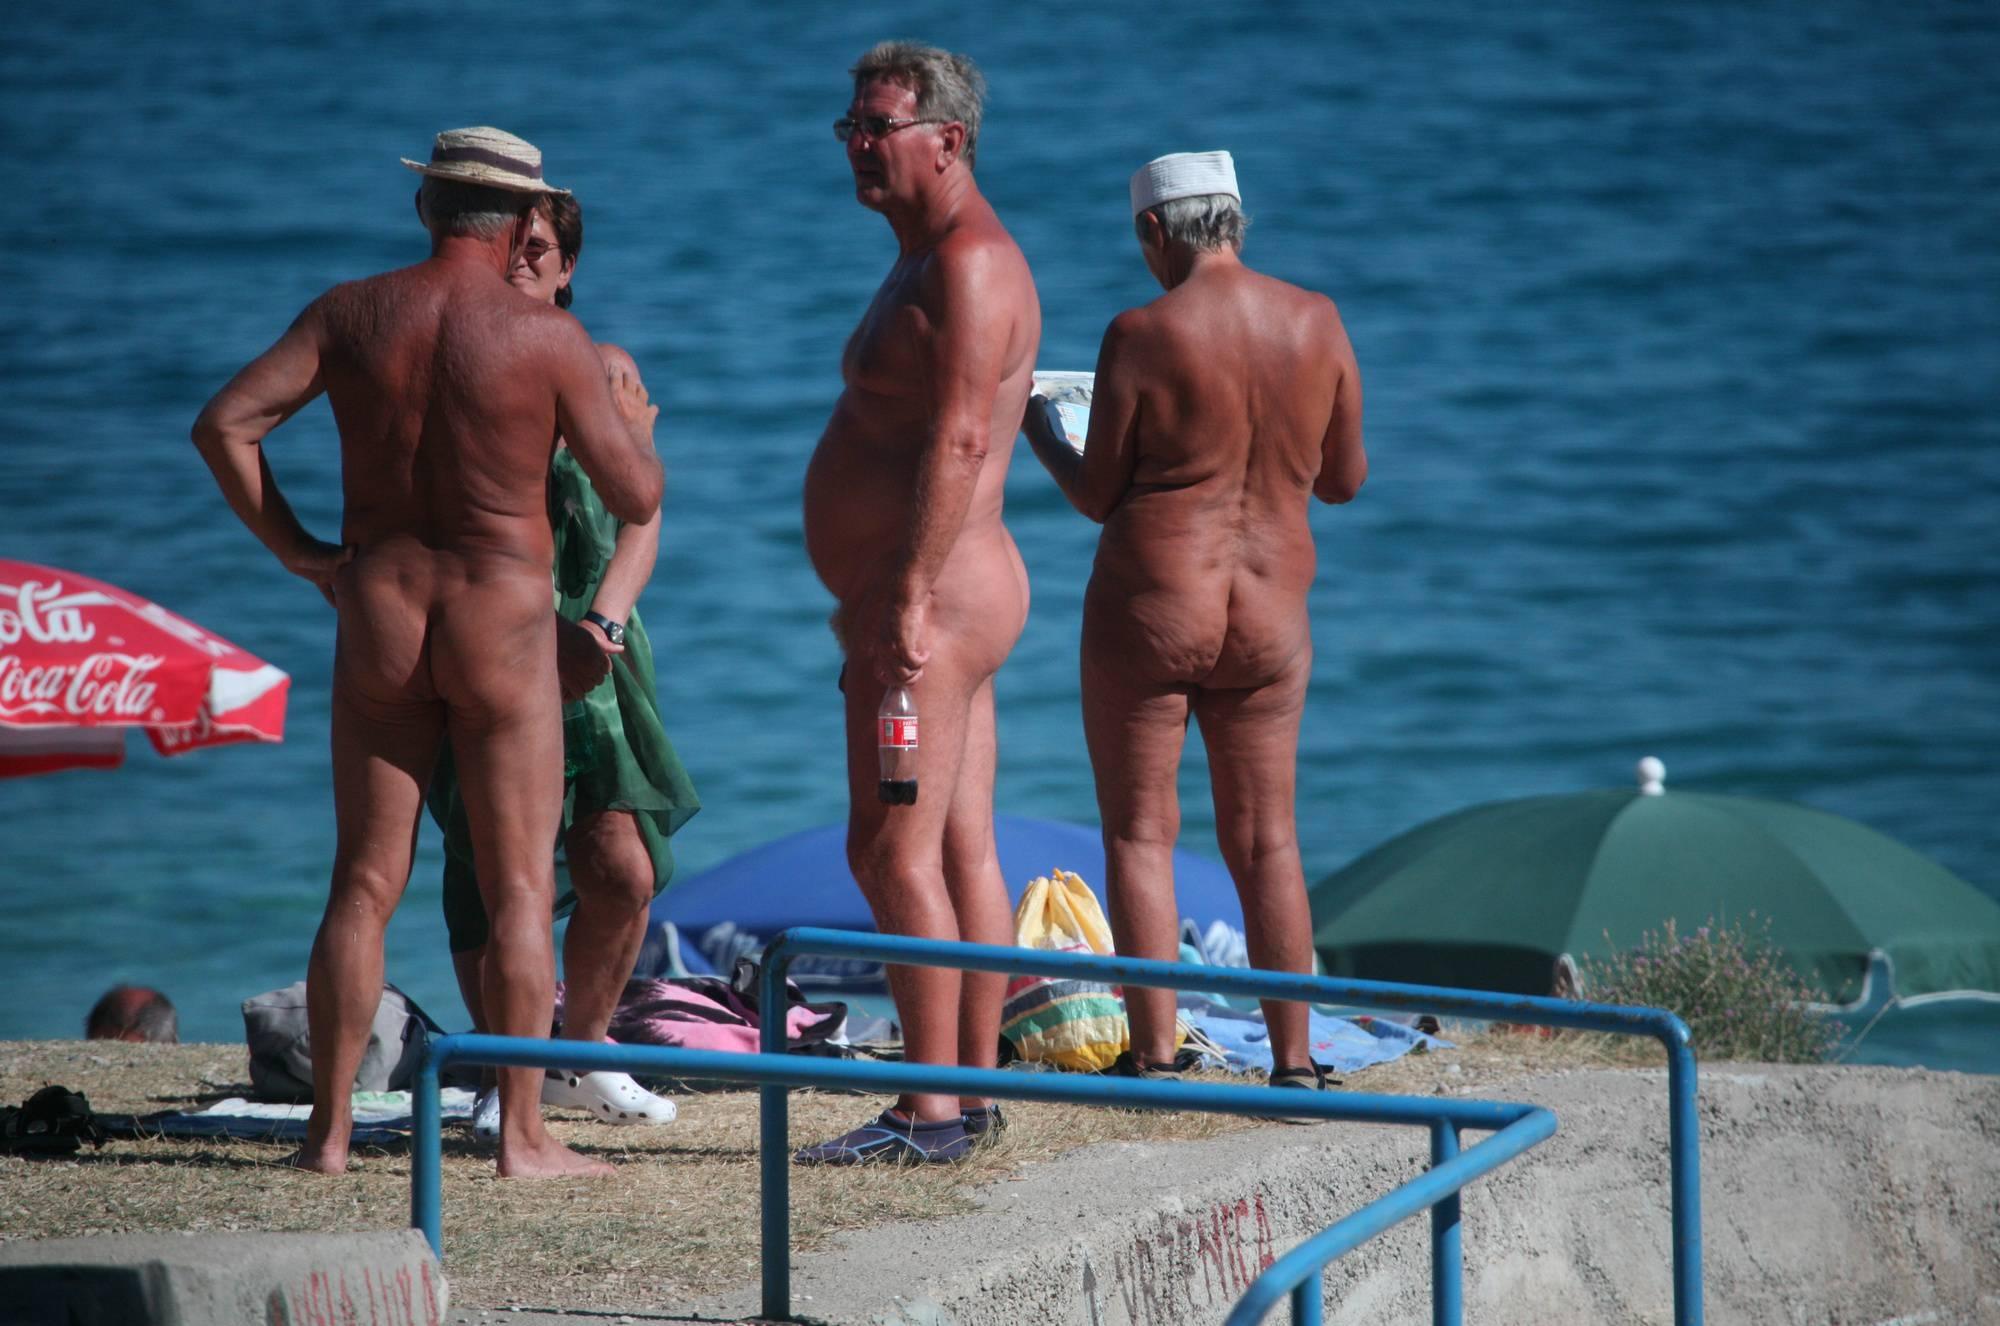 Nudist Pics Sunnyside Water Shore - 1